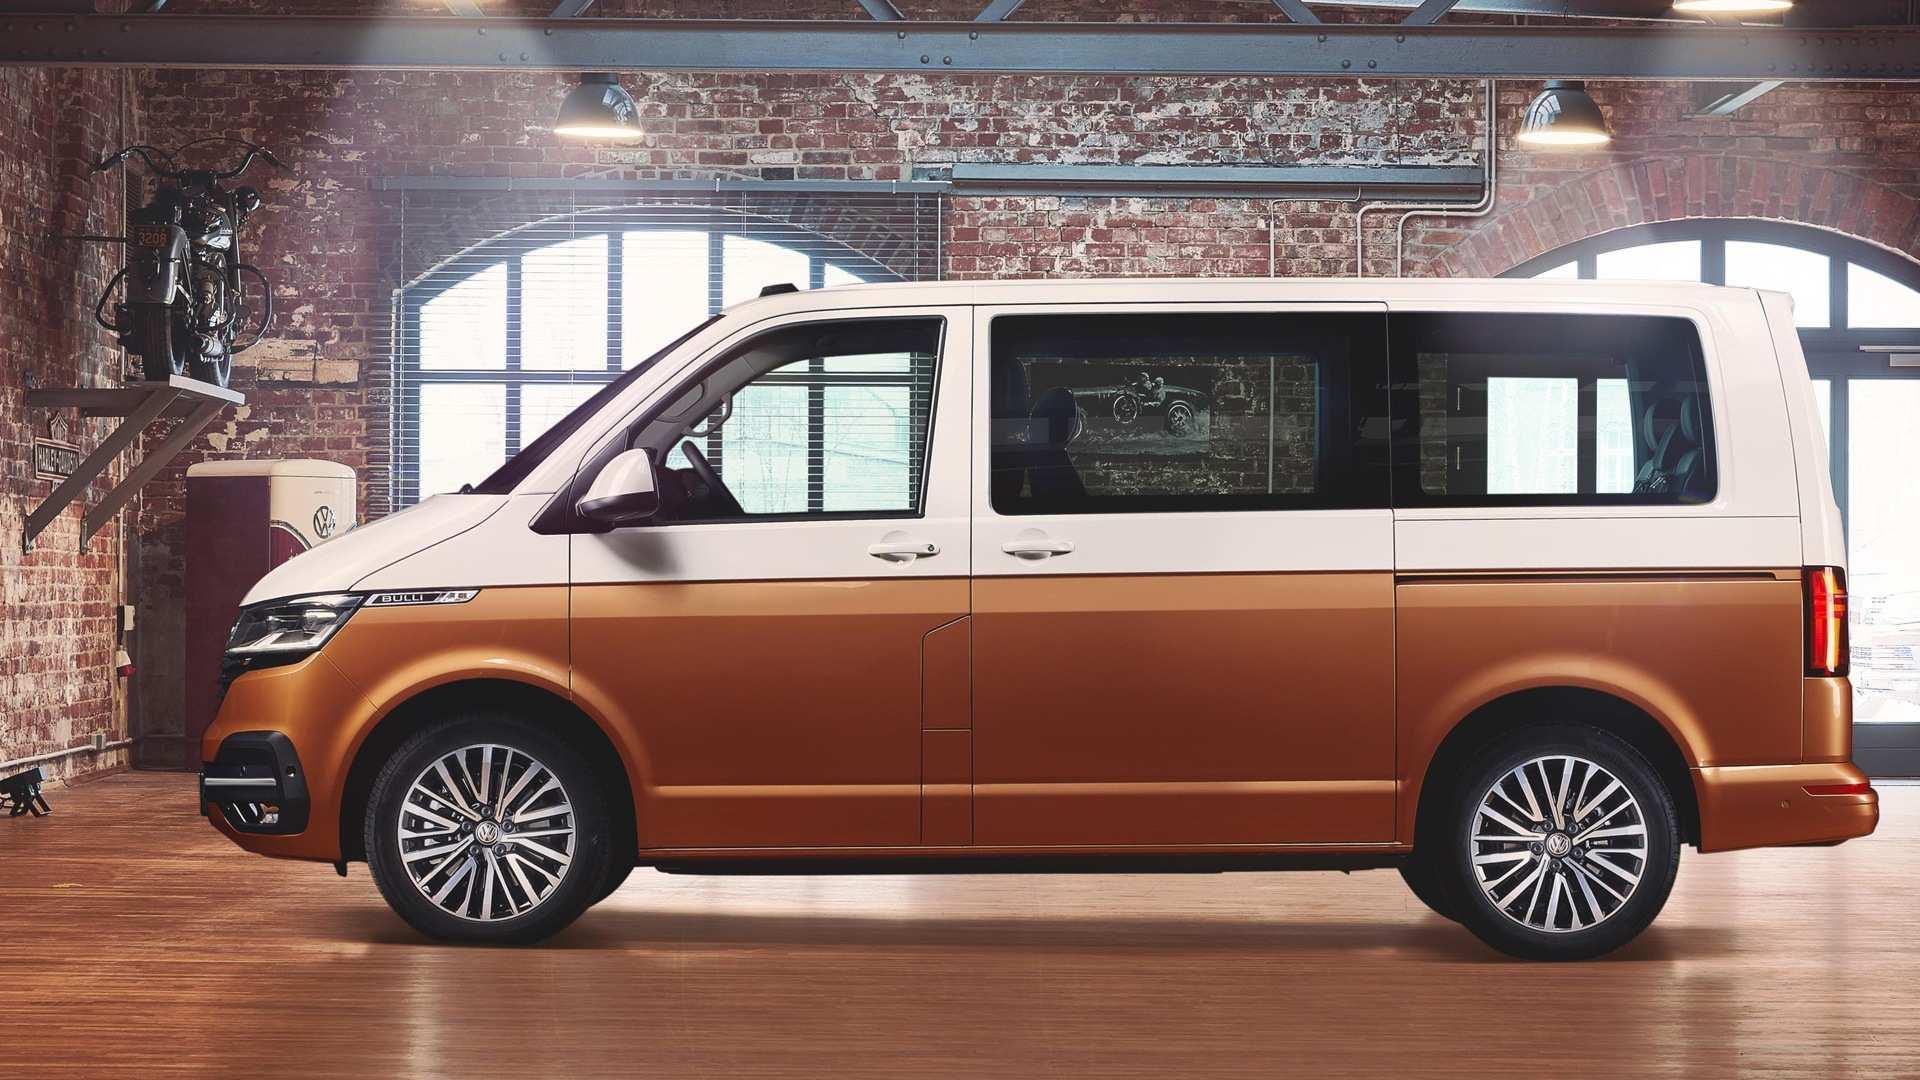 79 The Volkswagen Minibus 2020 Price by Volkswagen Minibus 2020